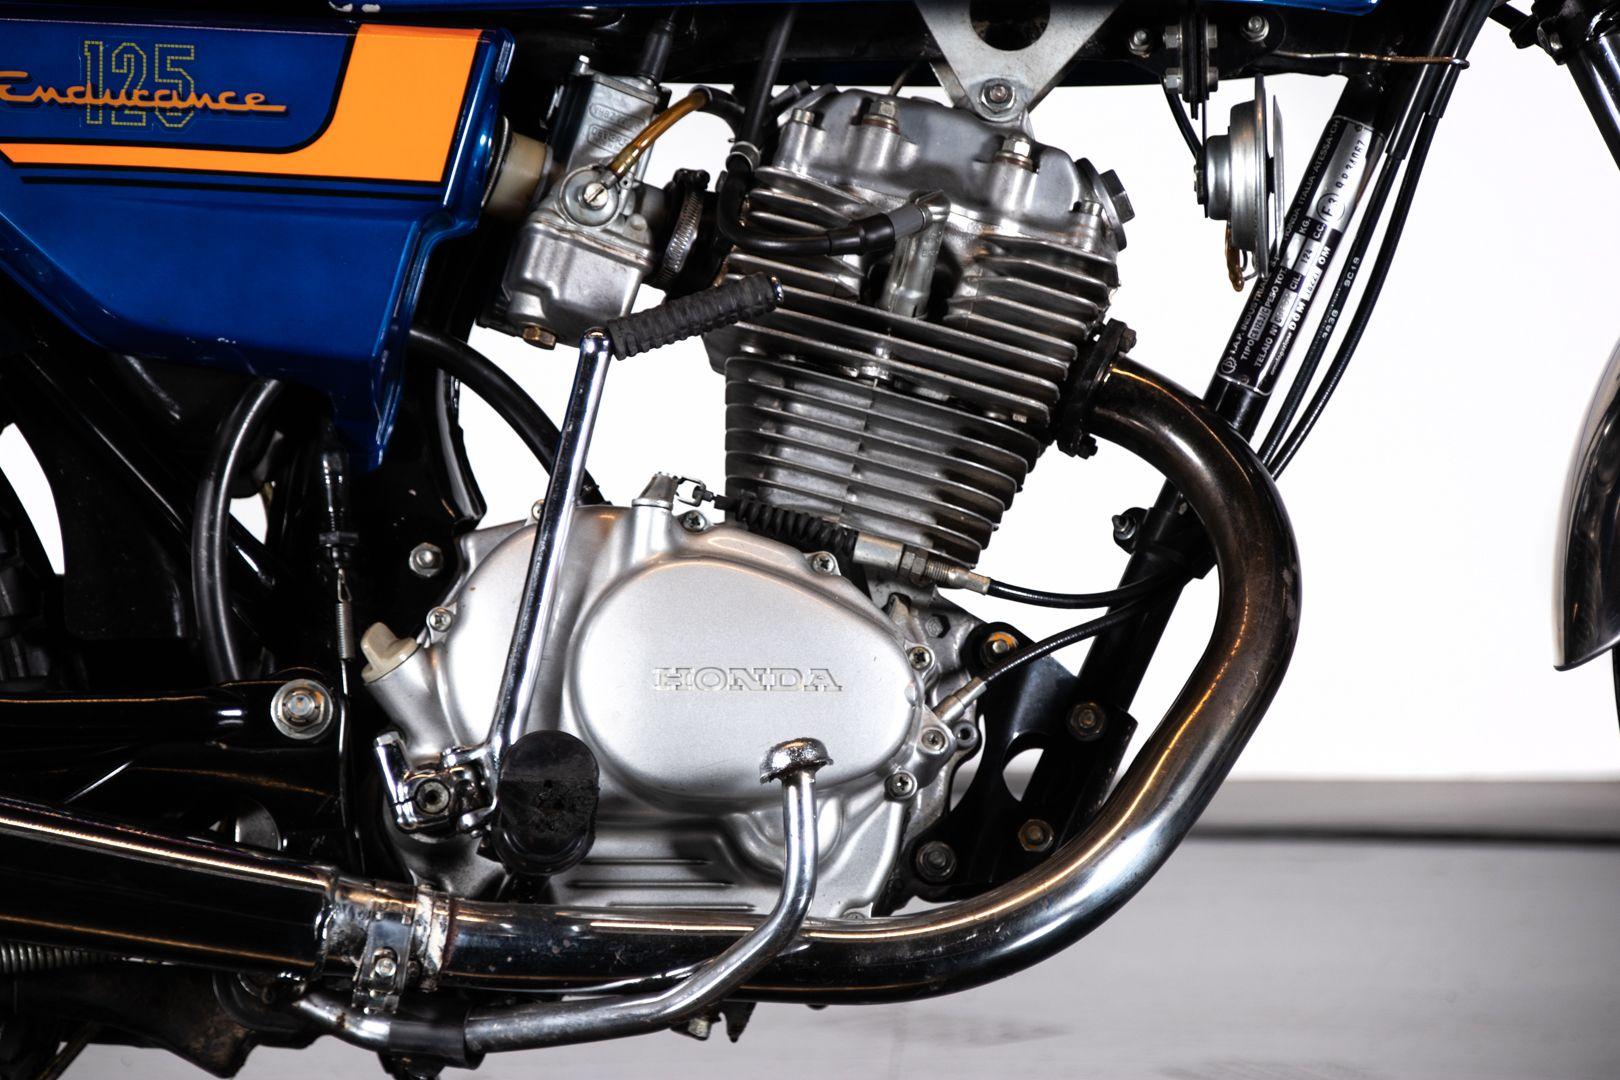 1980 Honda CB 125 7/C 63459